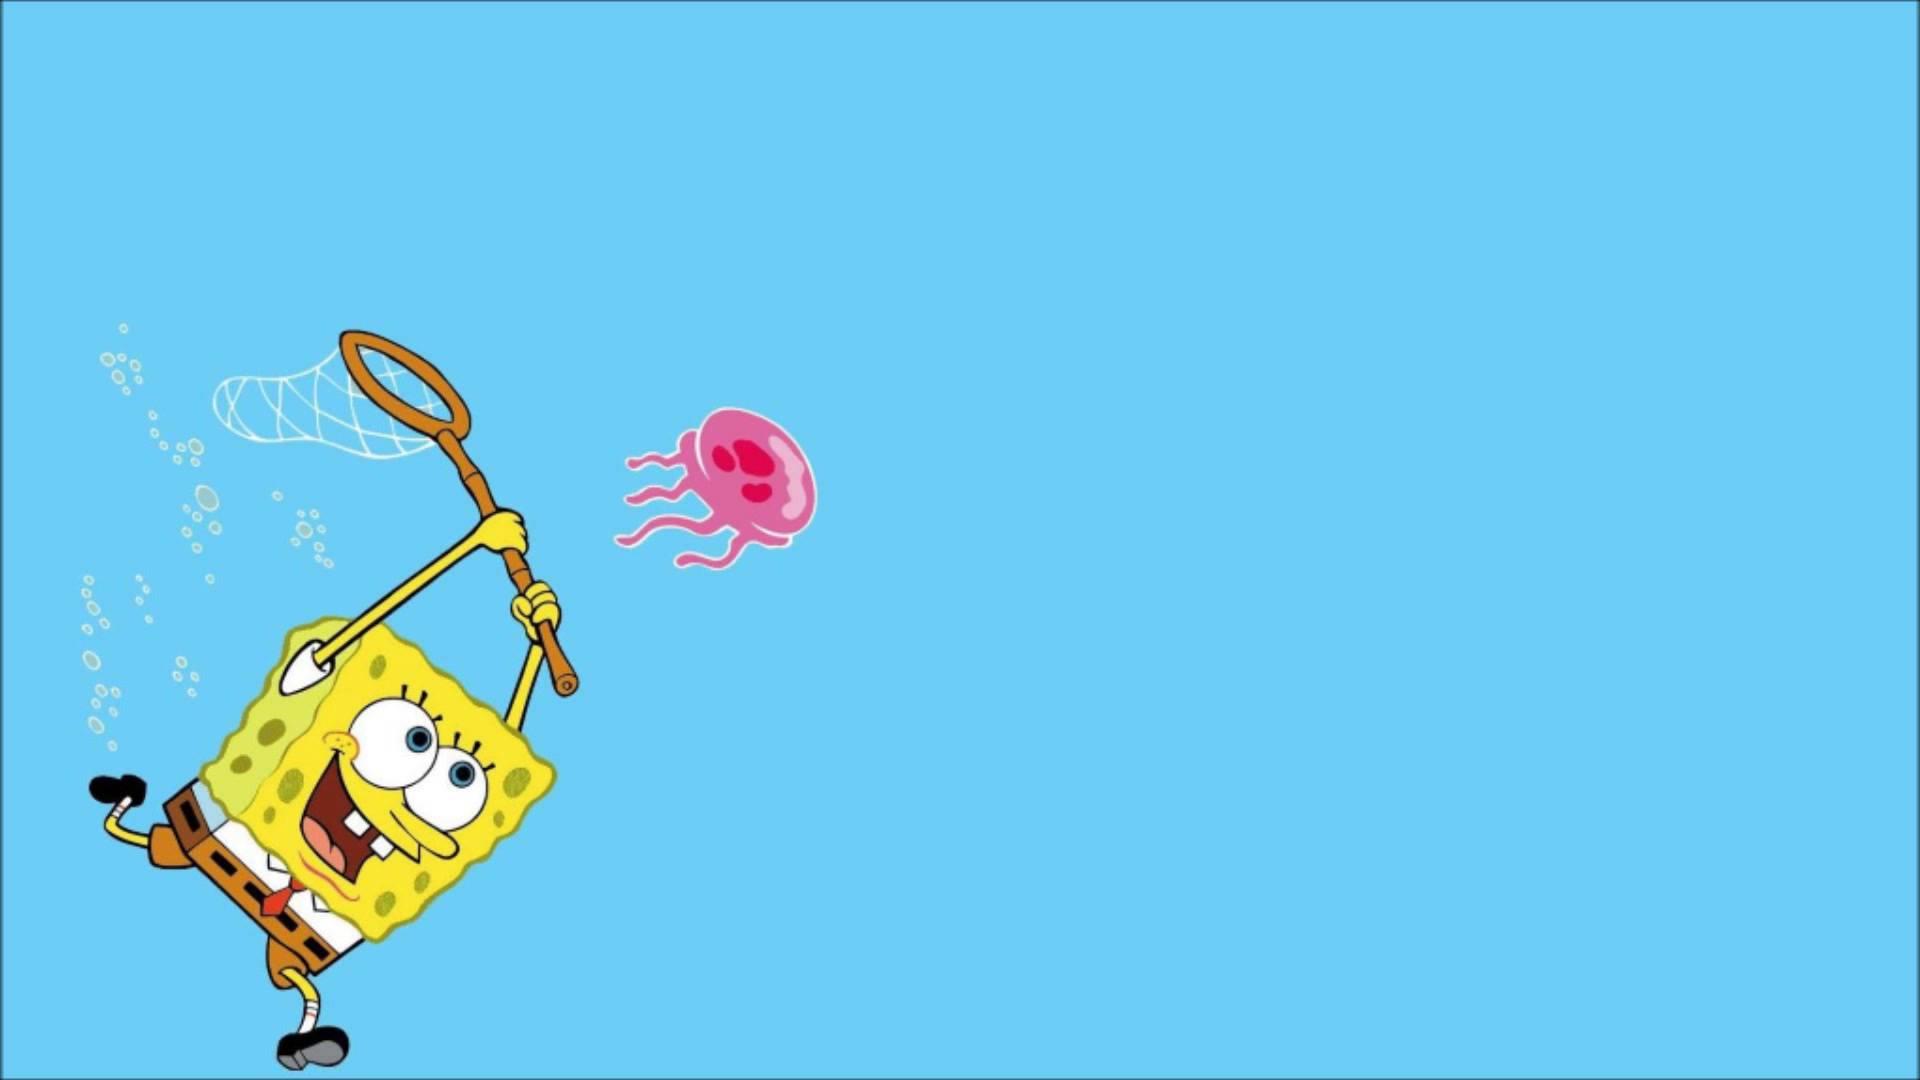 Spongebob Flower Sky Backgrounds Wallpaper Cave